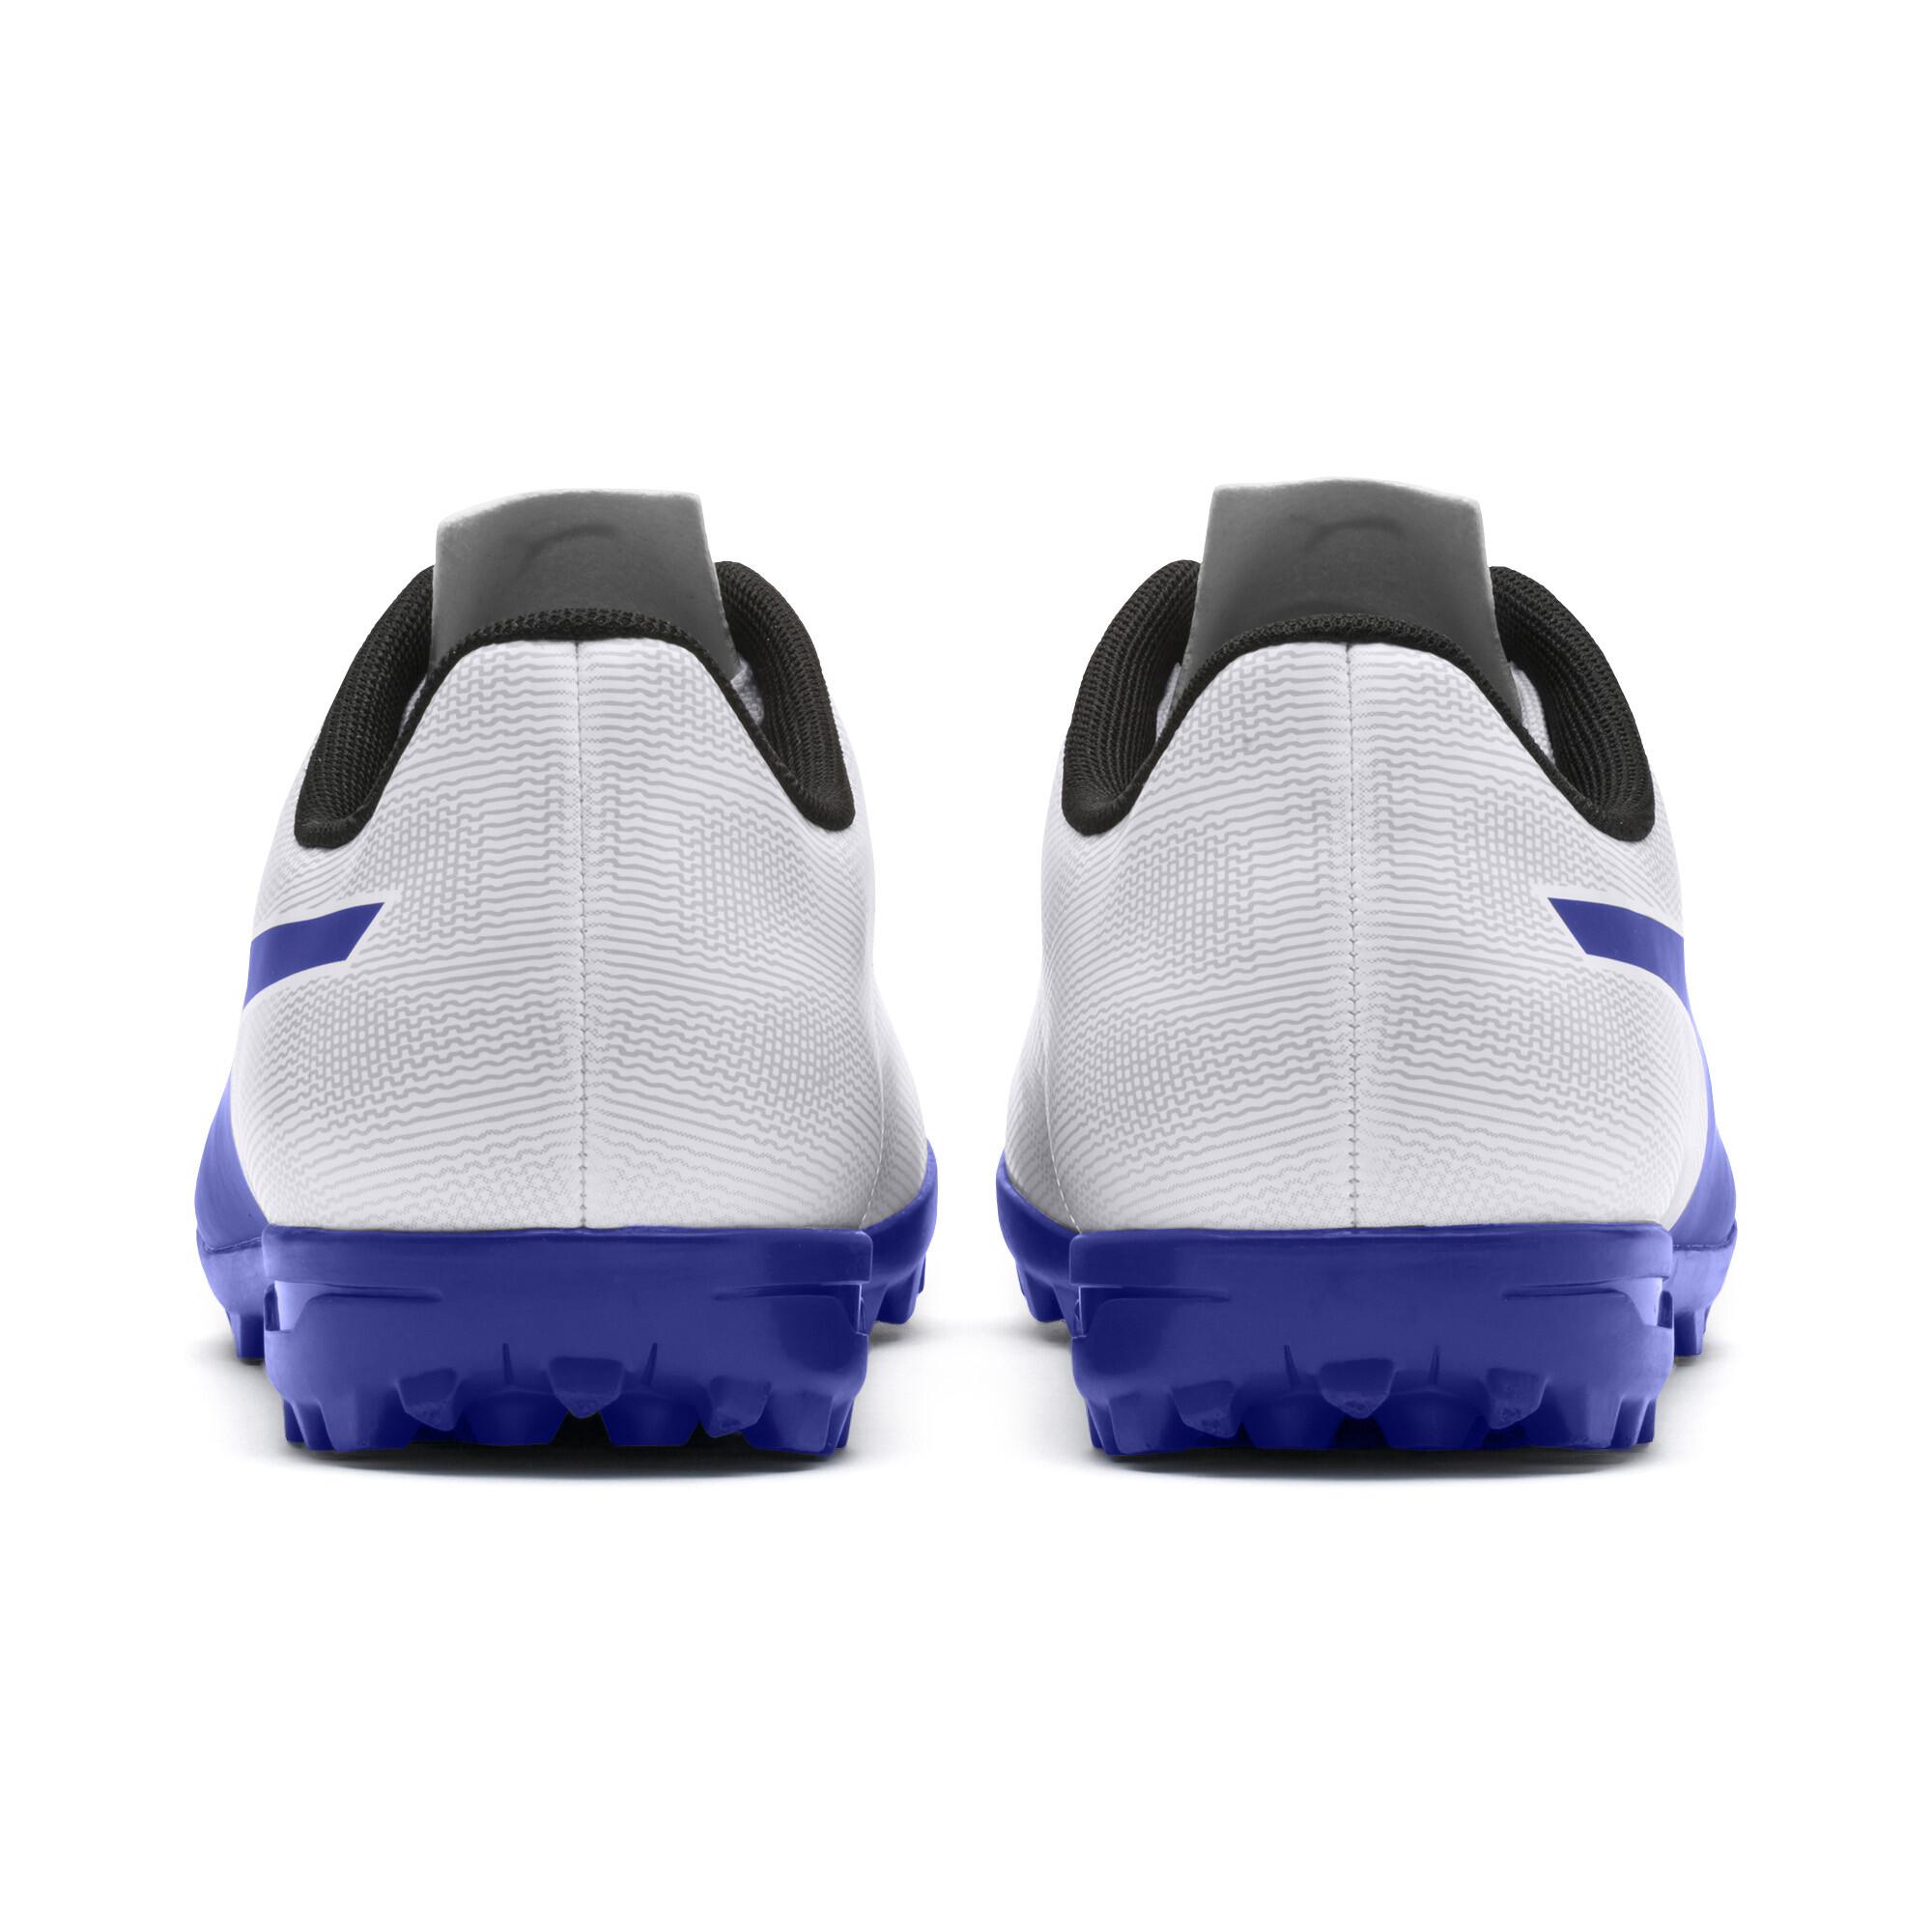 PUMA-Rapido-TT-Men-s-Soccer-Cleats-Men-Shoe-Football thumbnail 10